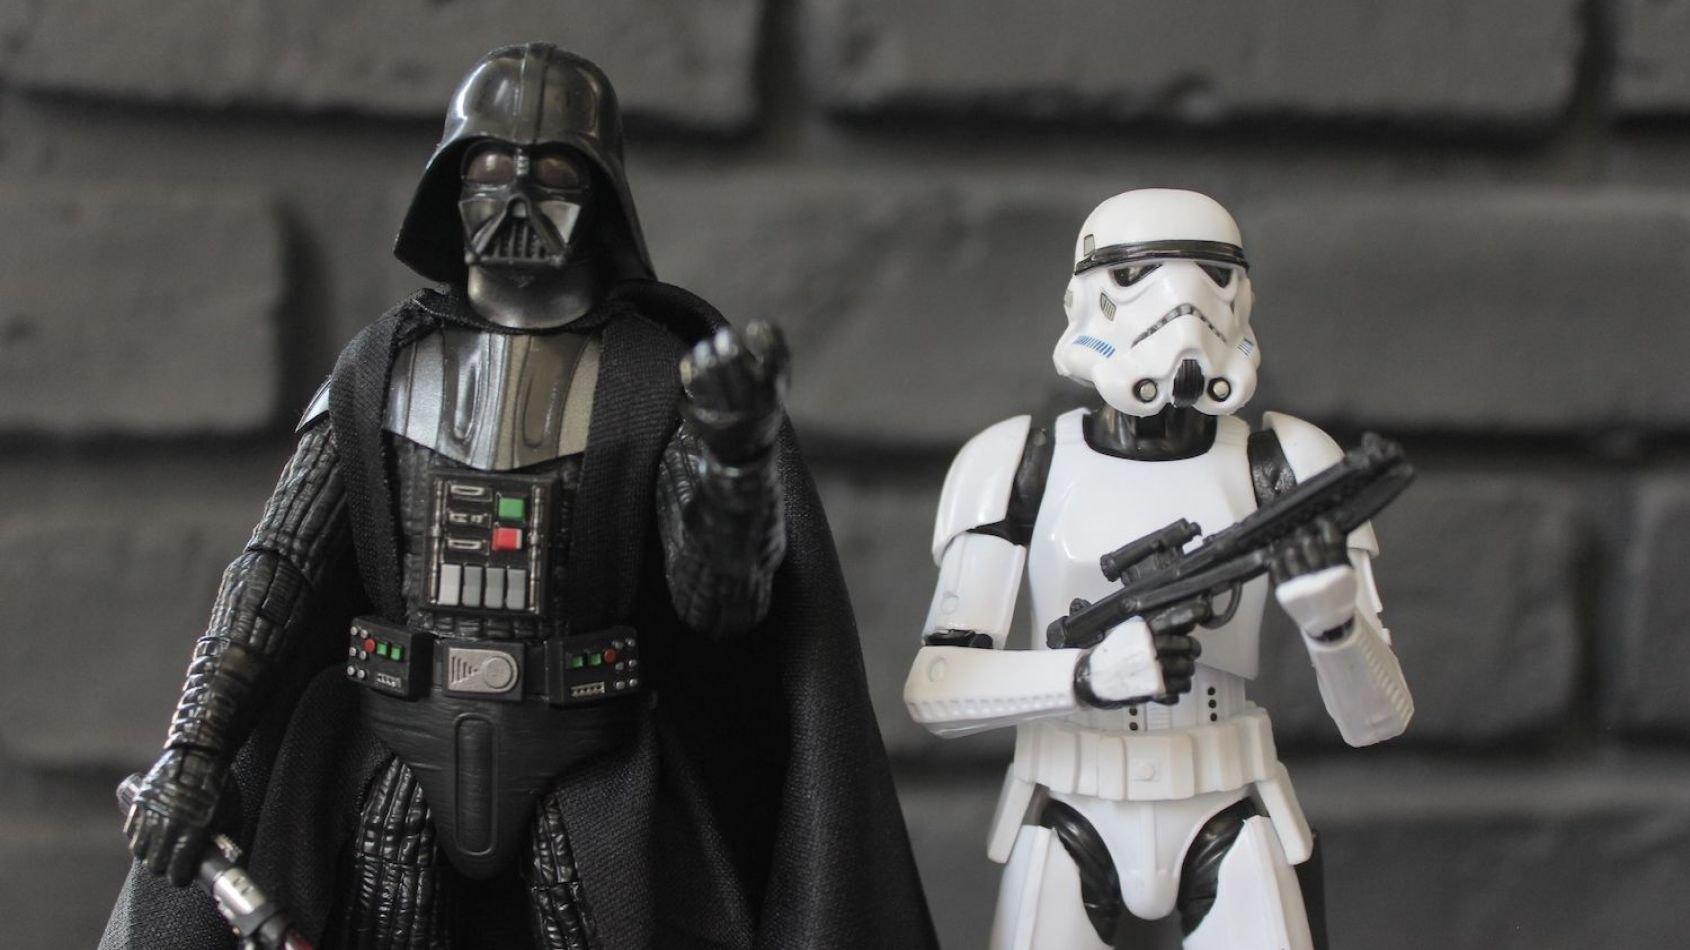 Review des Figurines Hasbro Black Series de Vador et du Stormtrooper